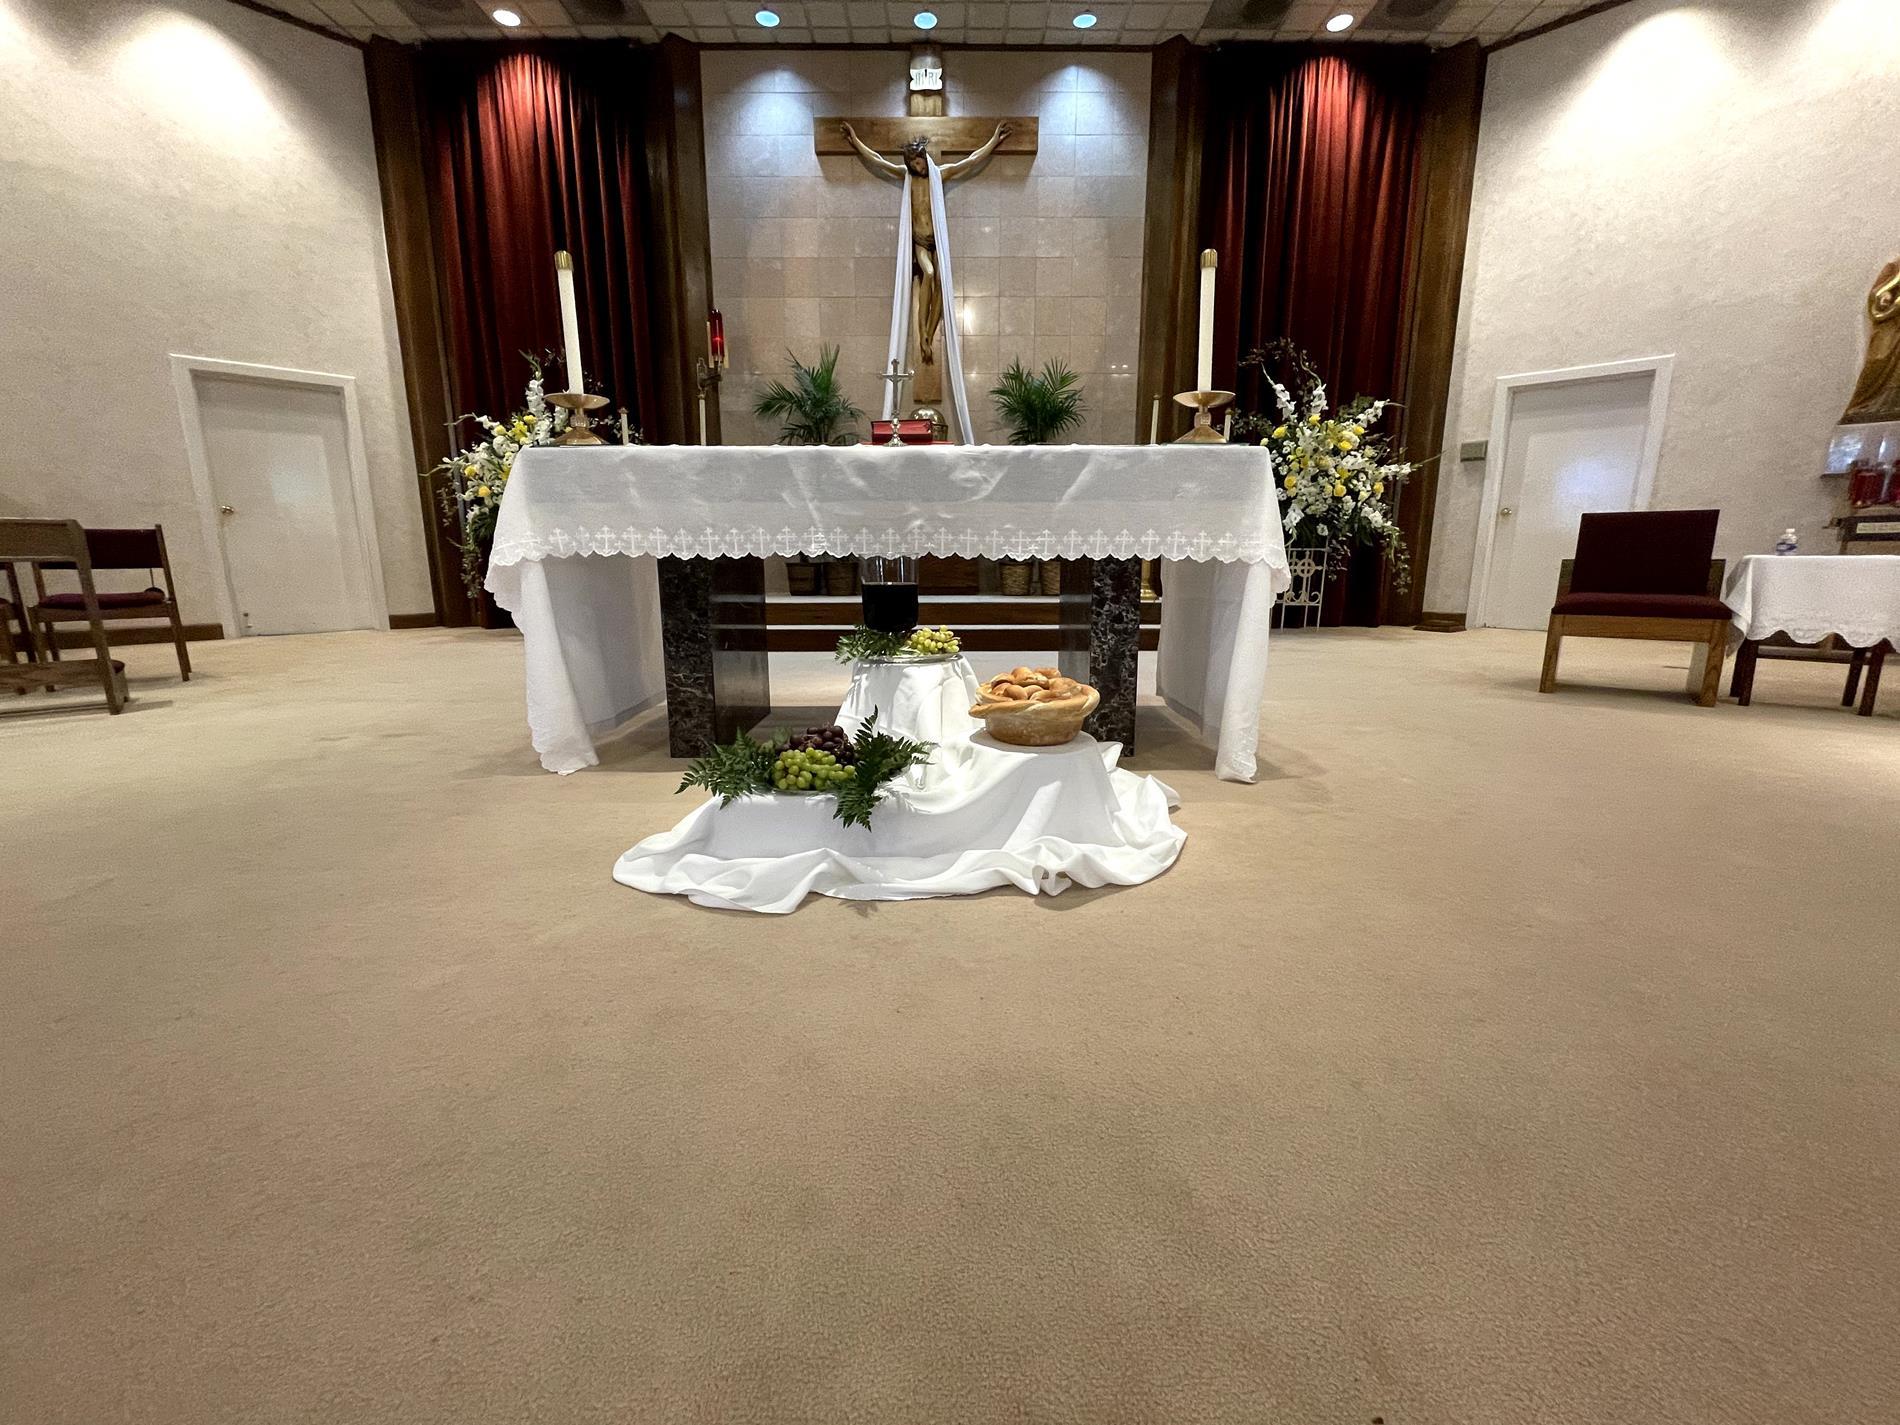 The beautiful altar